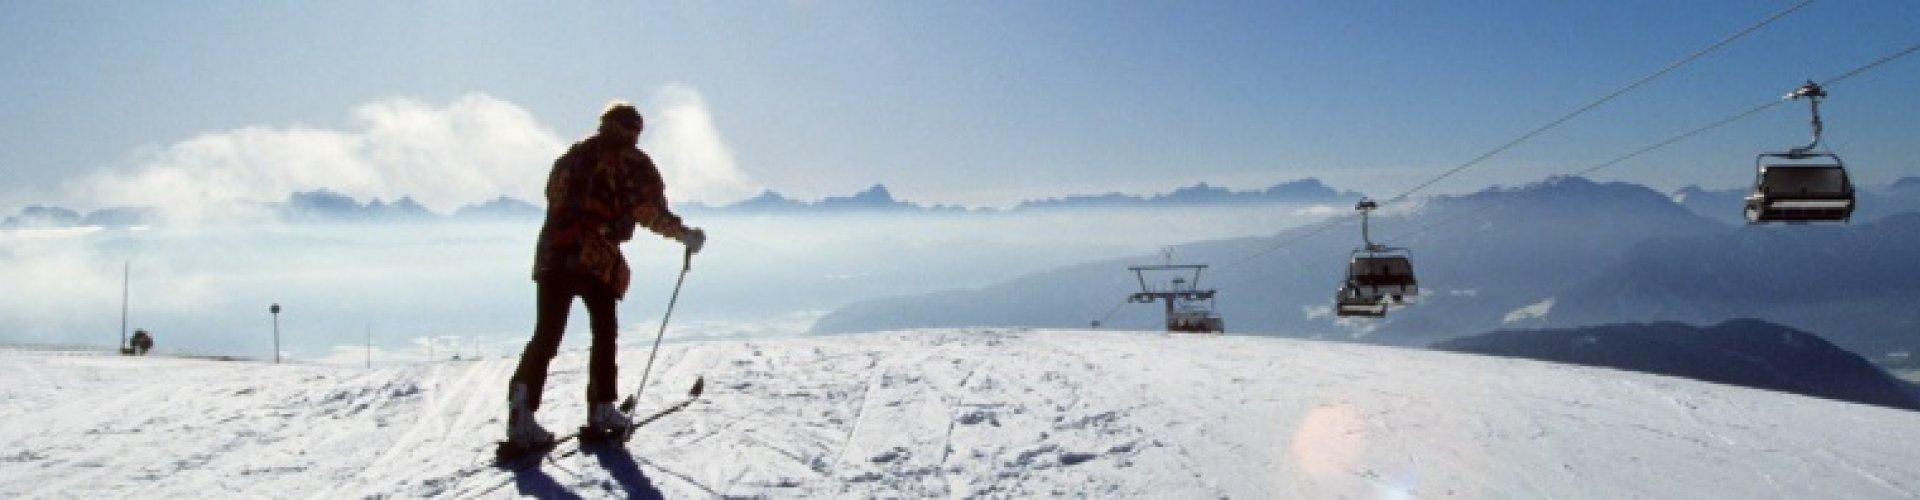 Skigebiet Winklmoosalm Steinplattereit Im Winkl